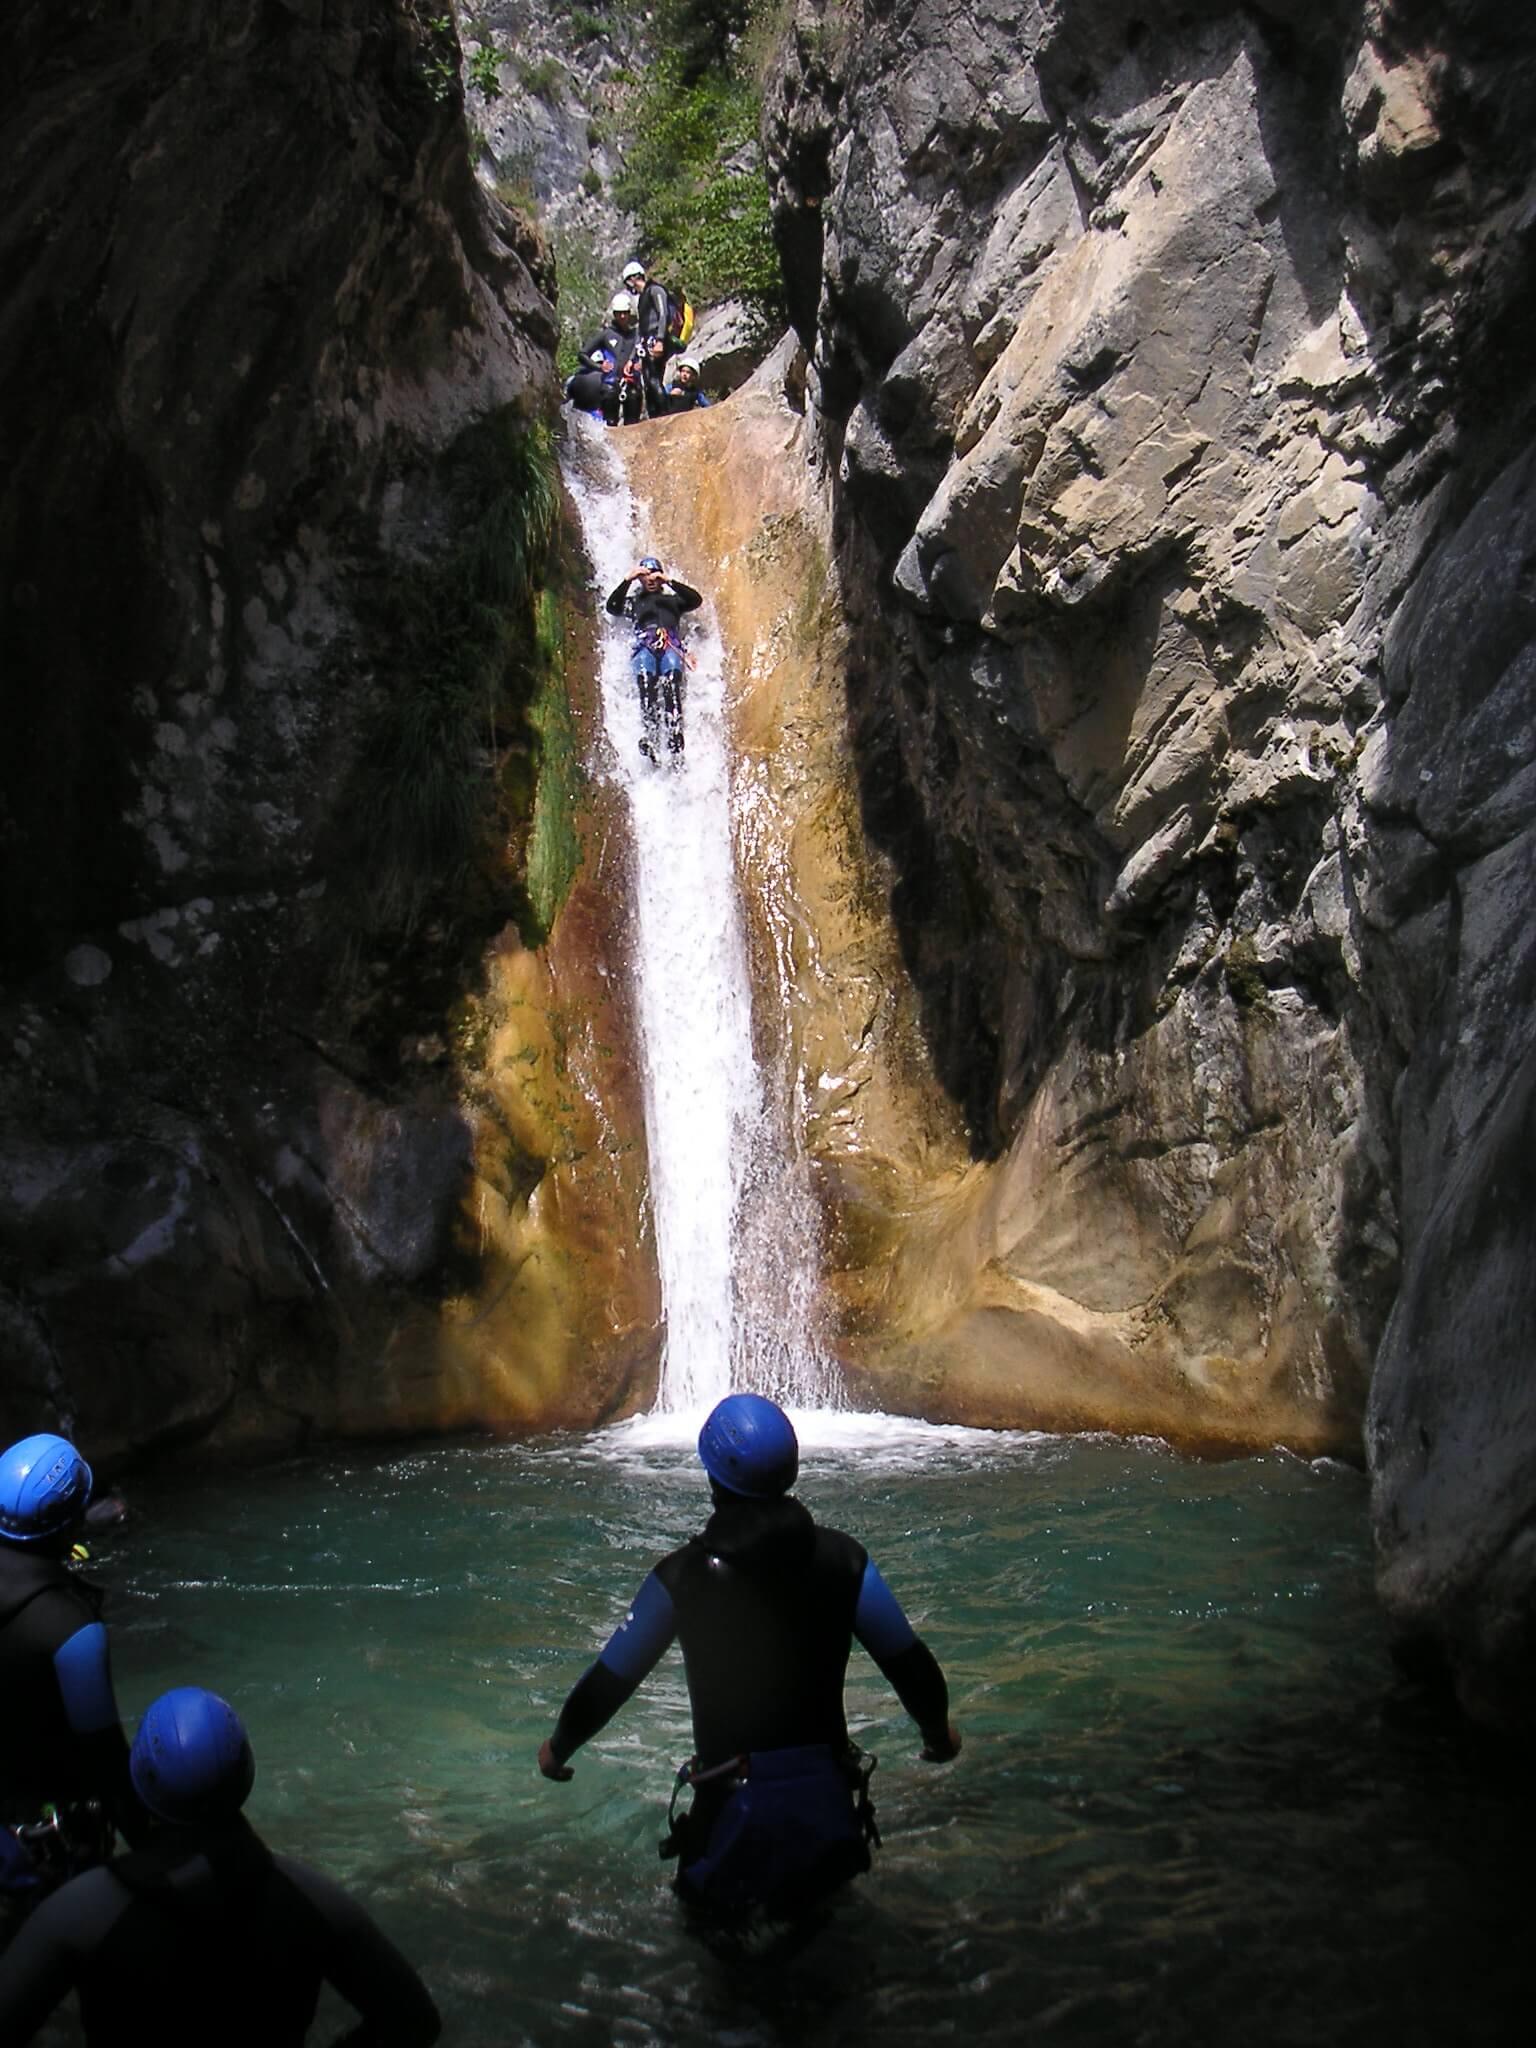 Canyoning Maglia - Canyoneering Breil Roya Valley - South ...